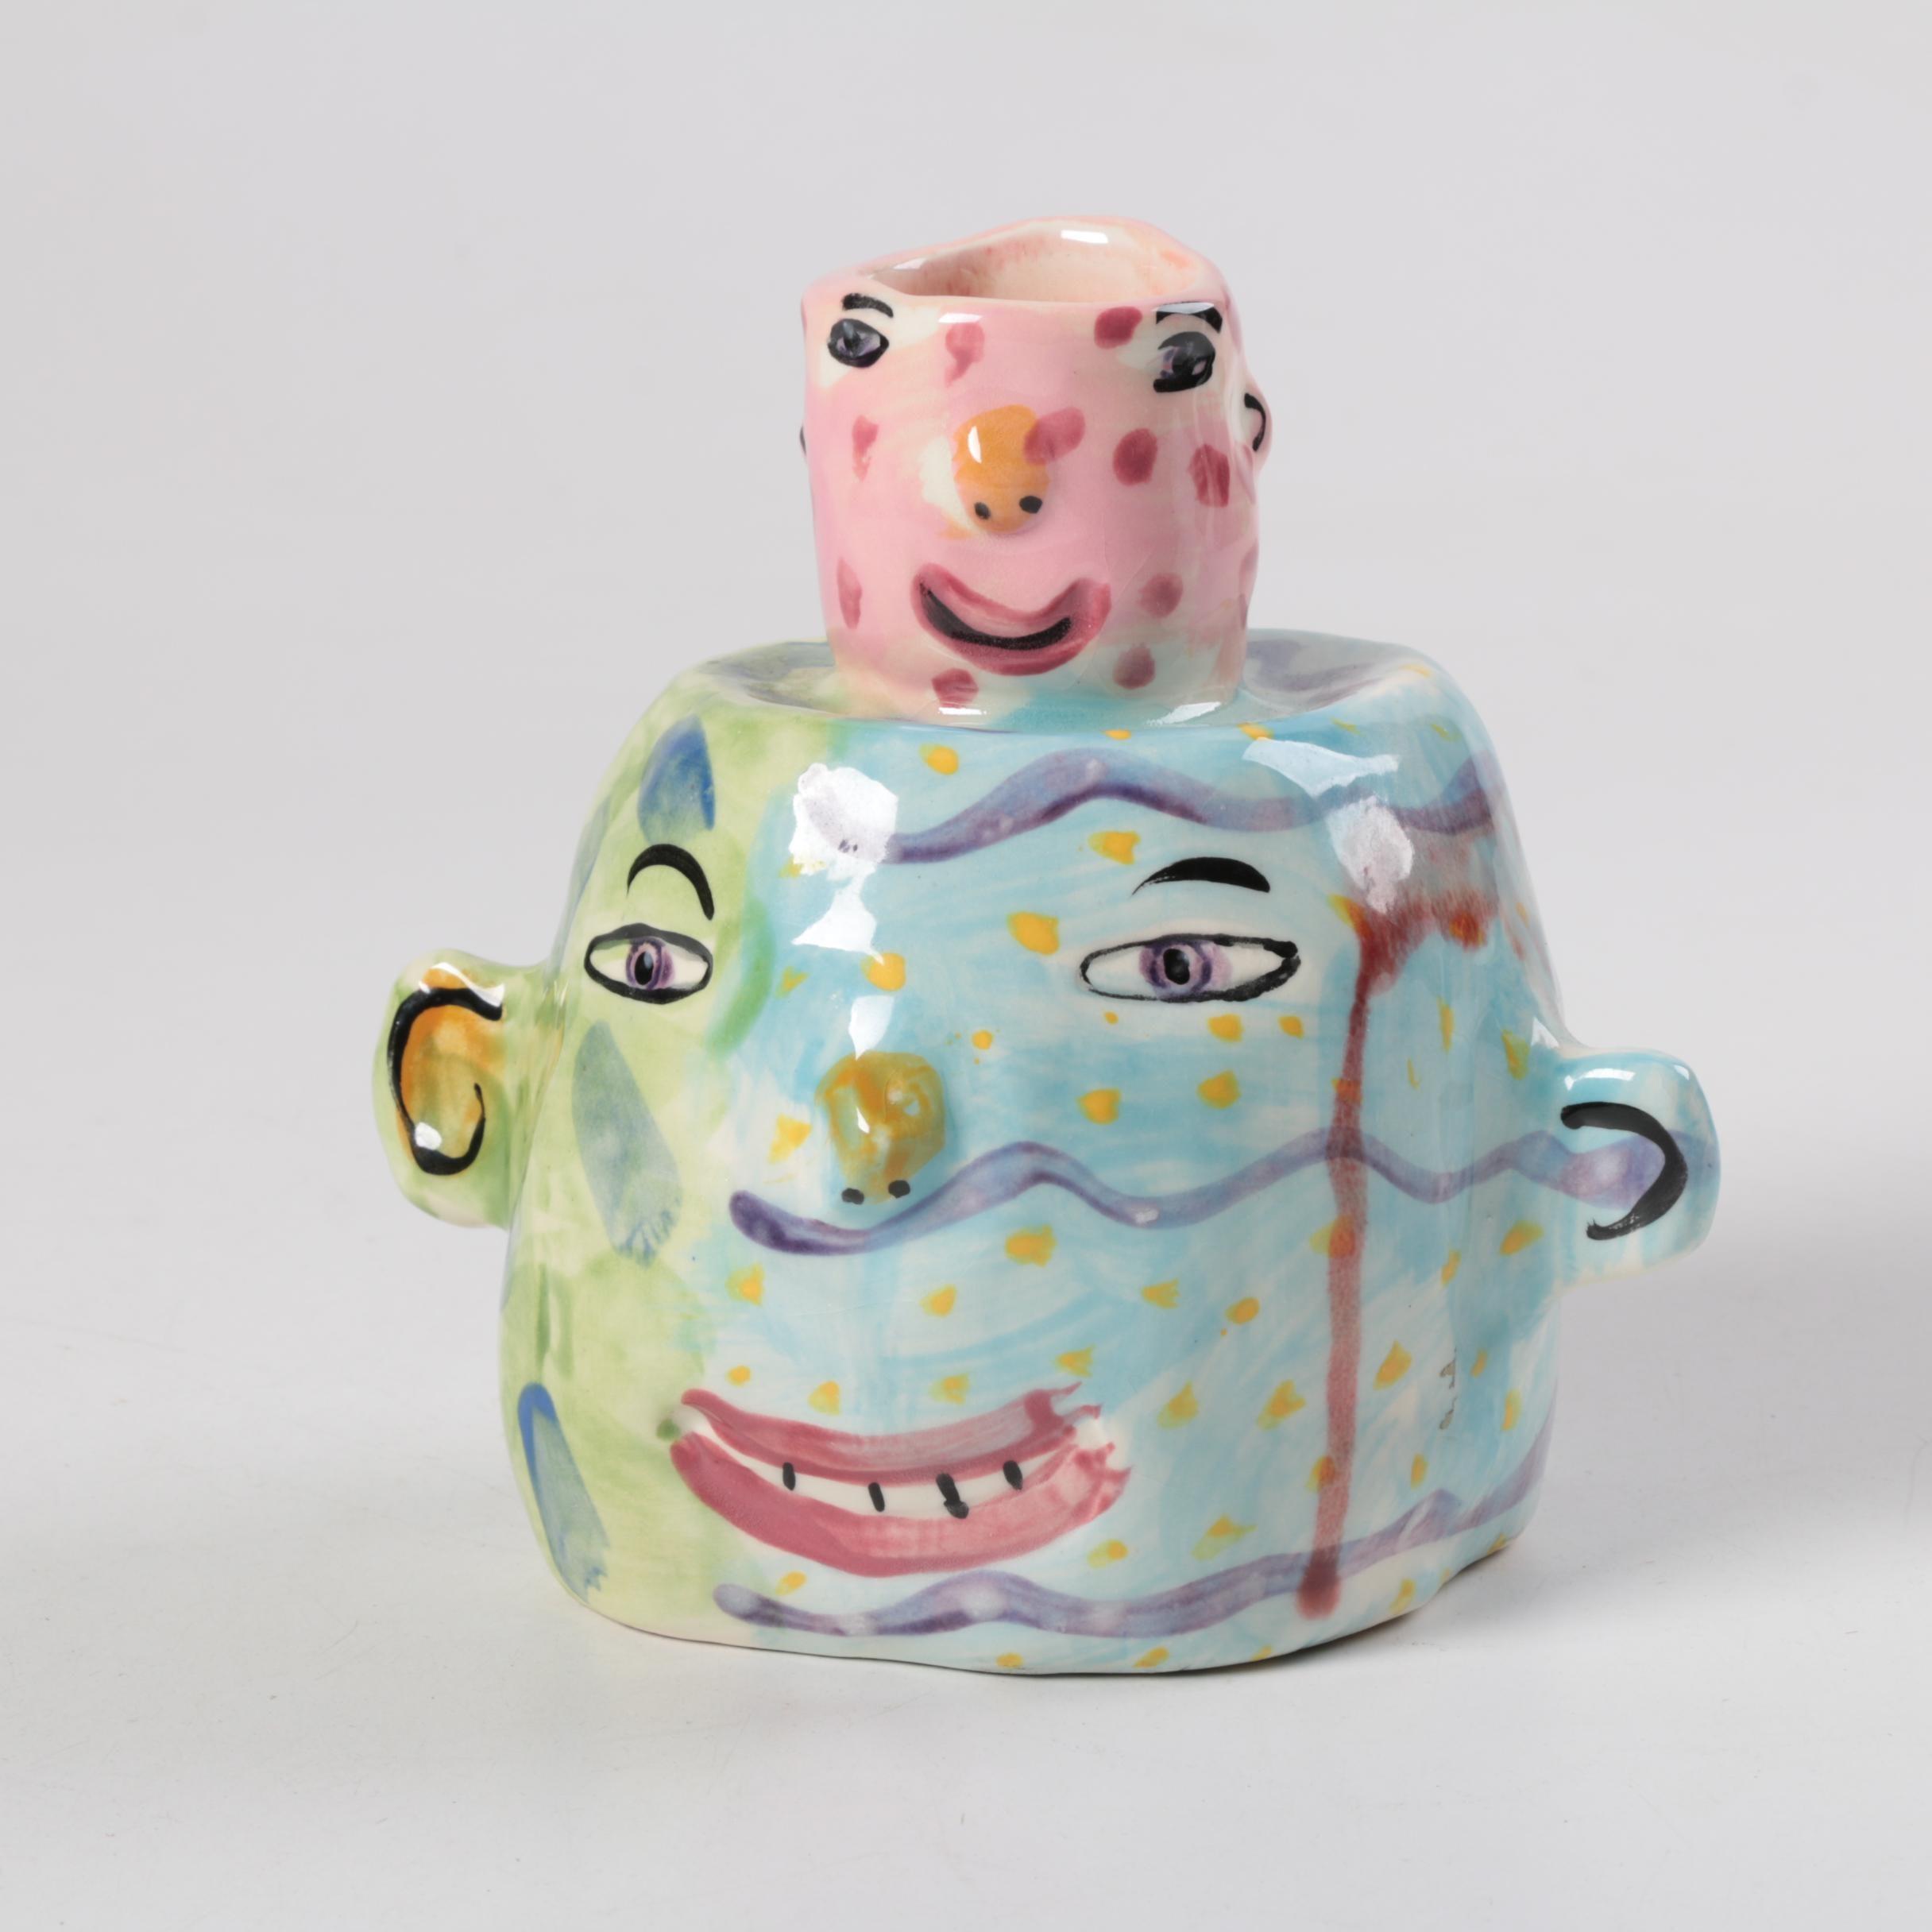 "SIgned ""Izwin"" Colorful Ceramic Candle Holder"